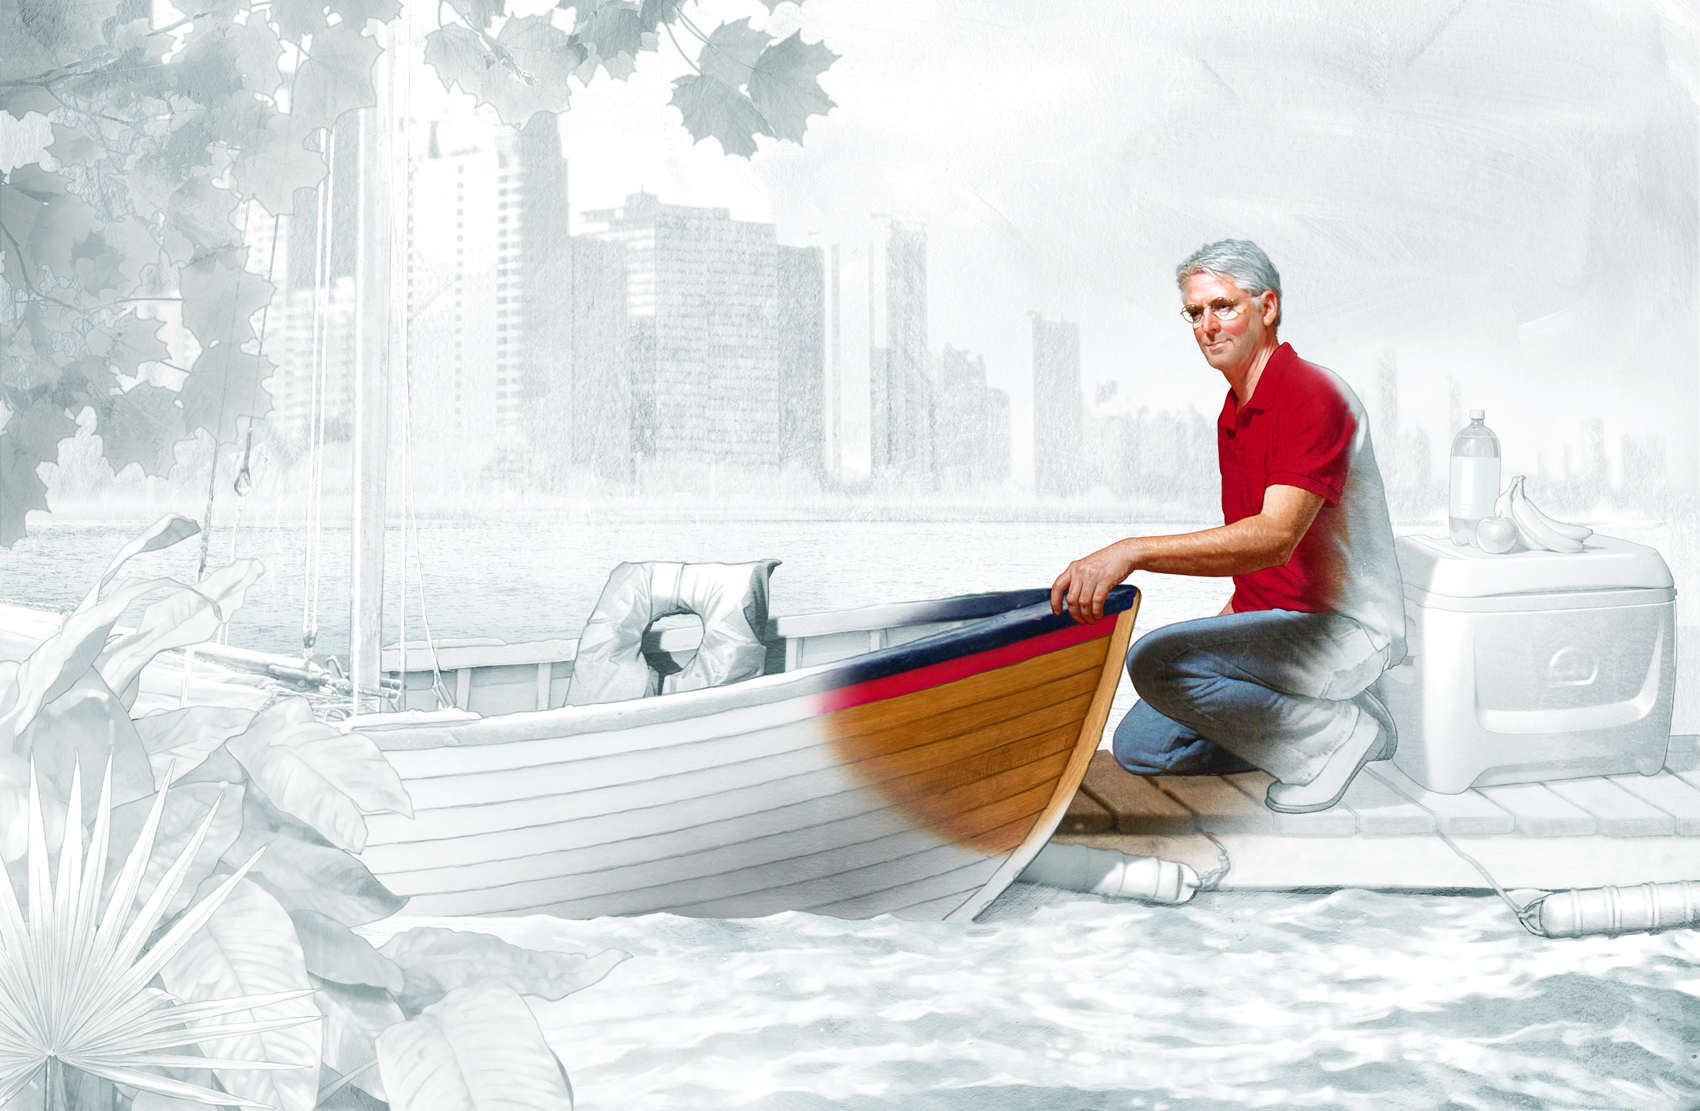 COPD+sailboat+comp+1++final+1